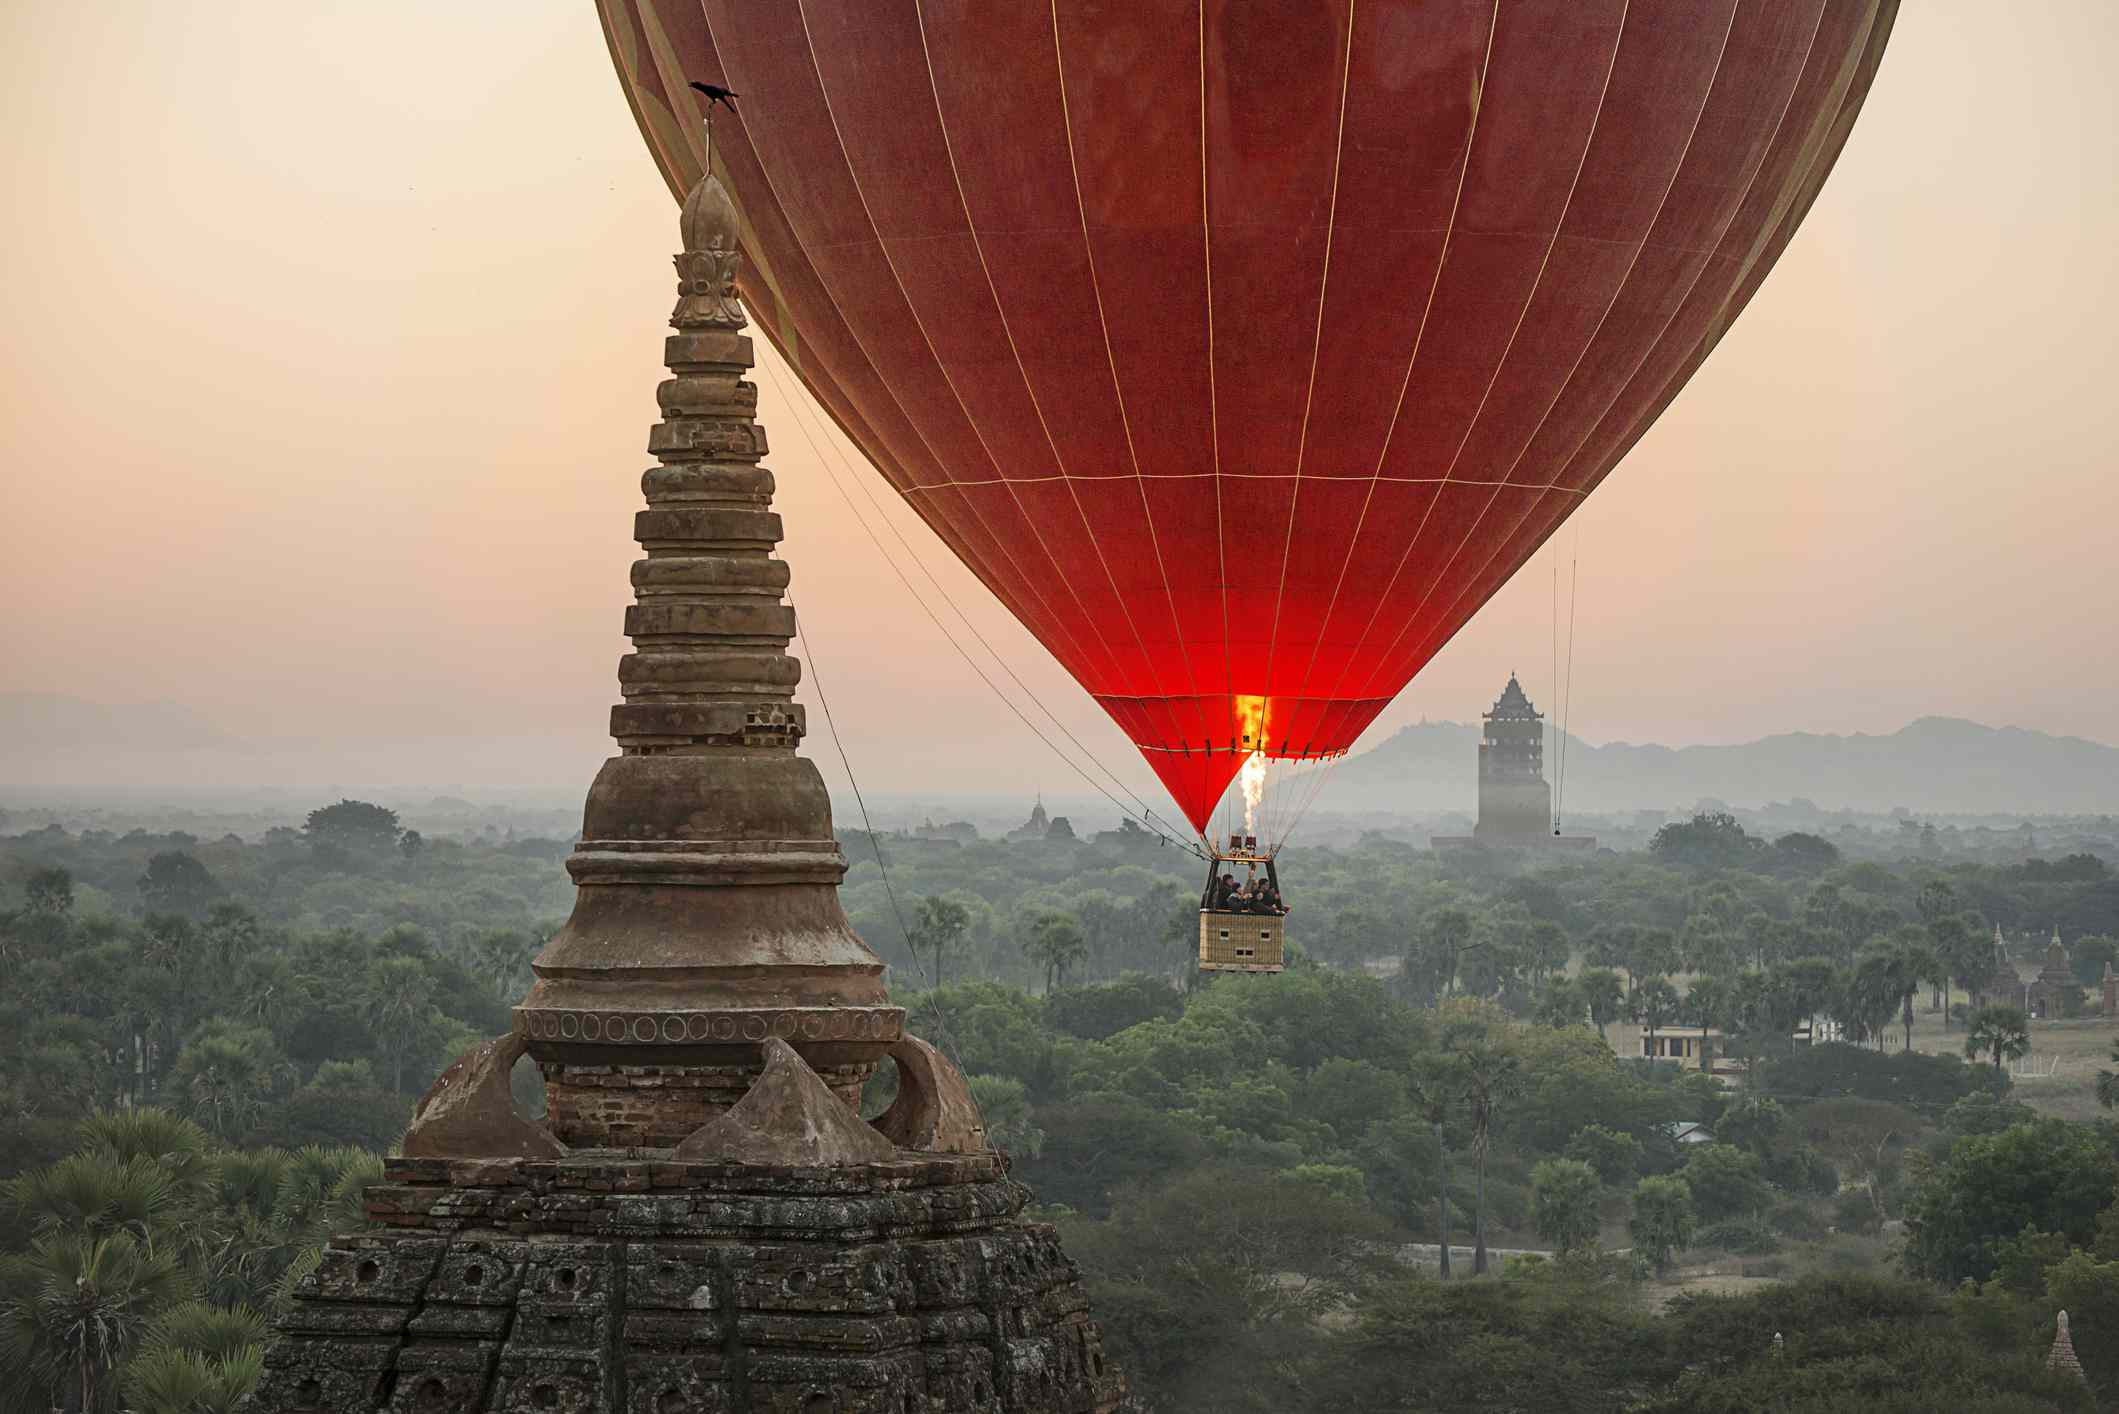 Hot air balloon over Bagan temple, Myanmar